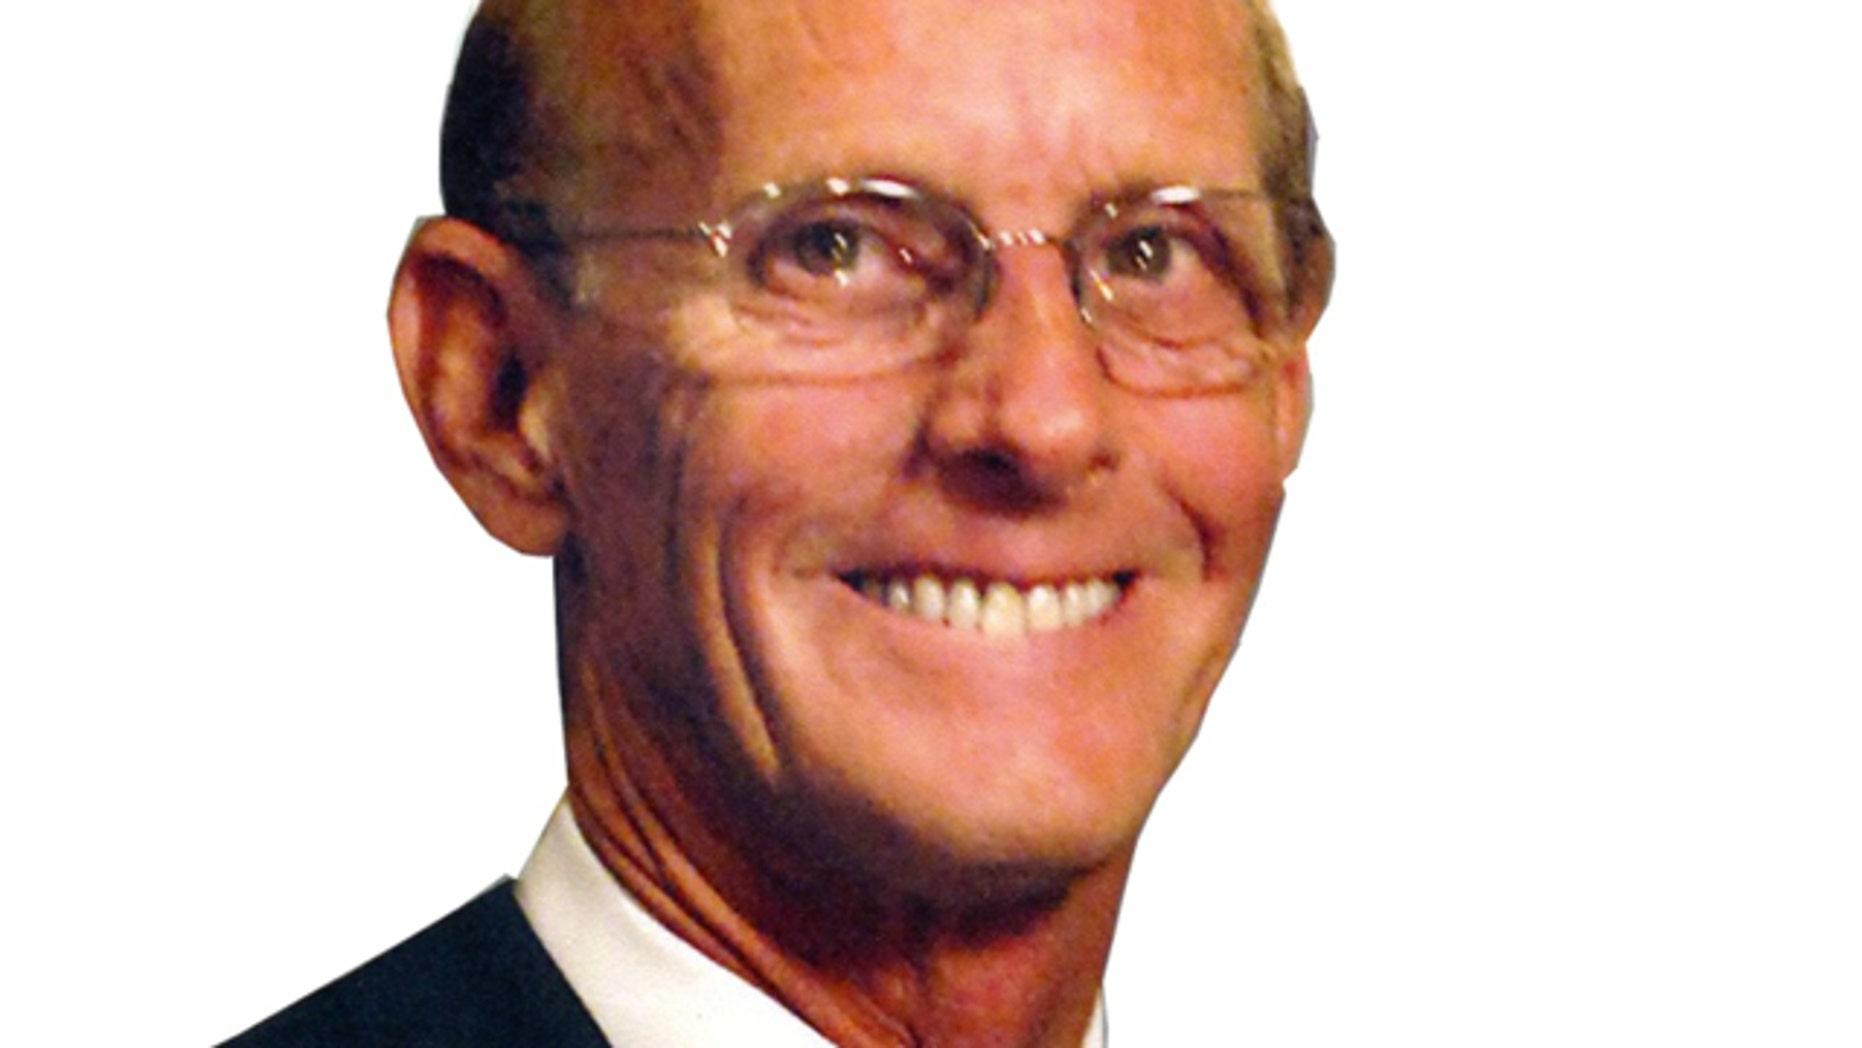 Tom Sponseller, a South Carolina restaurant lobbyist, was found dead of a self-inflicted gunshot wound.